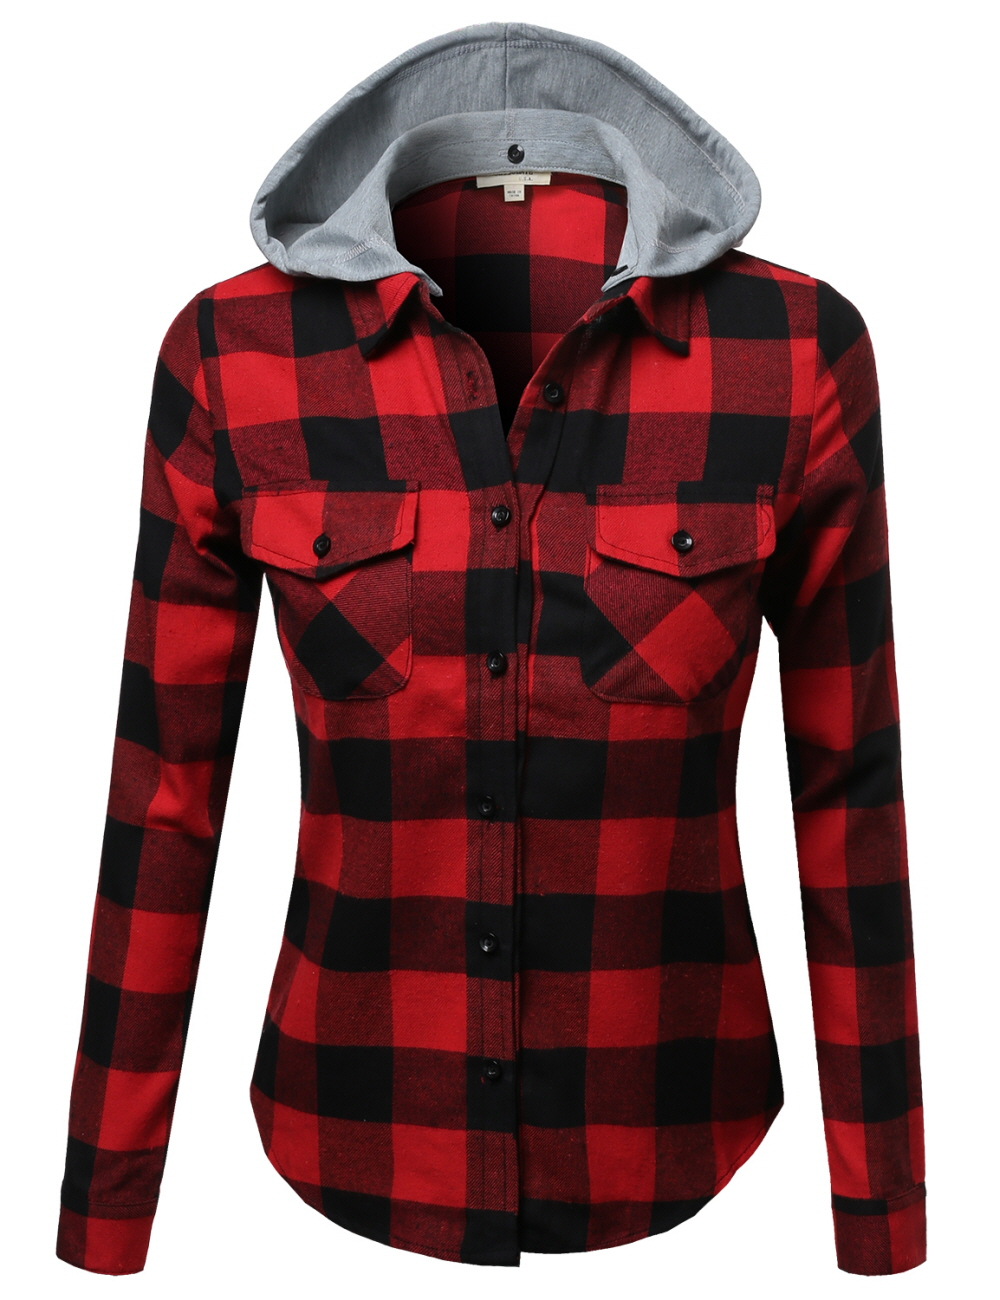 Fashionoutfit women 39 s casual soft plaid check detachable for Super soft flannel shirts